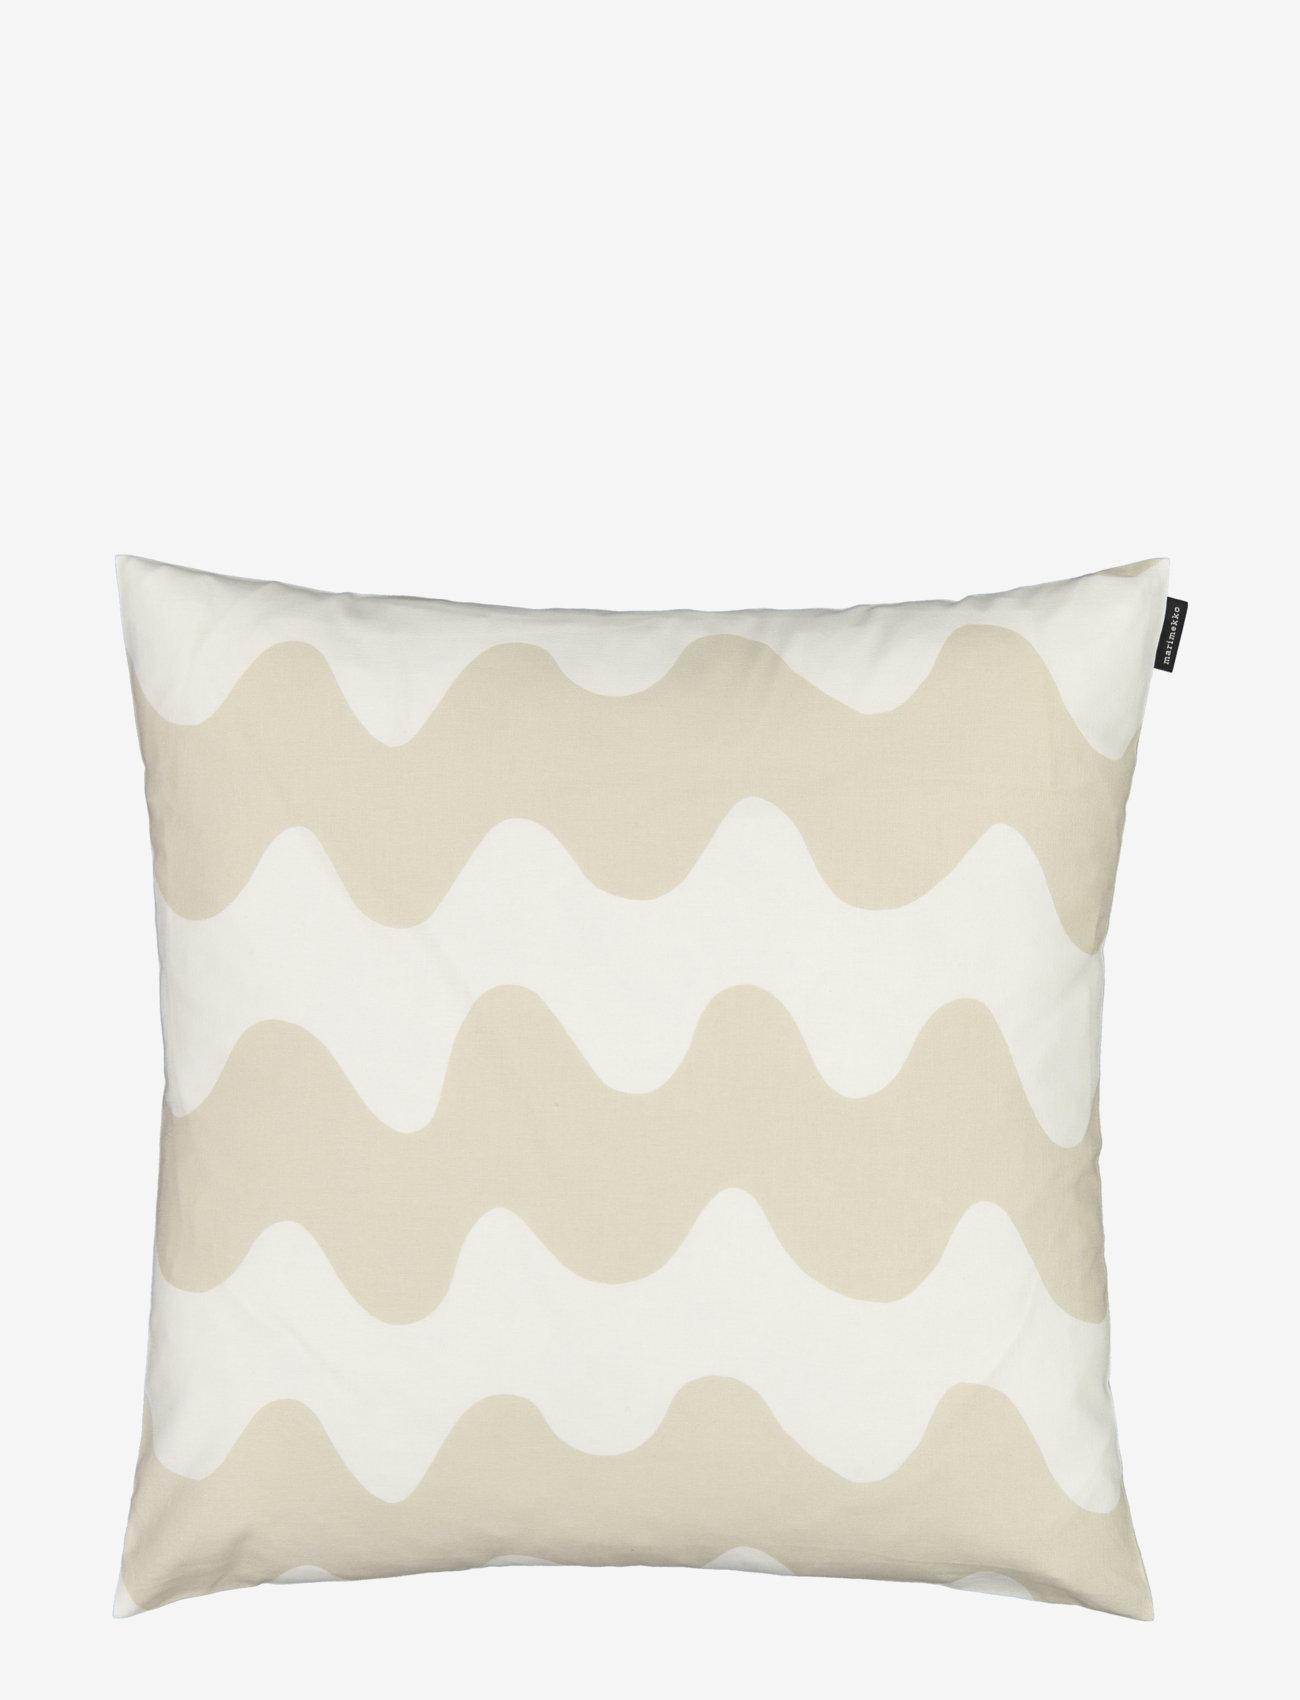 Marimekko Home - PIKKULOKKI CUSHION COVER - taie d'oreiller - white, beige - 0